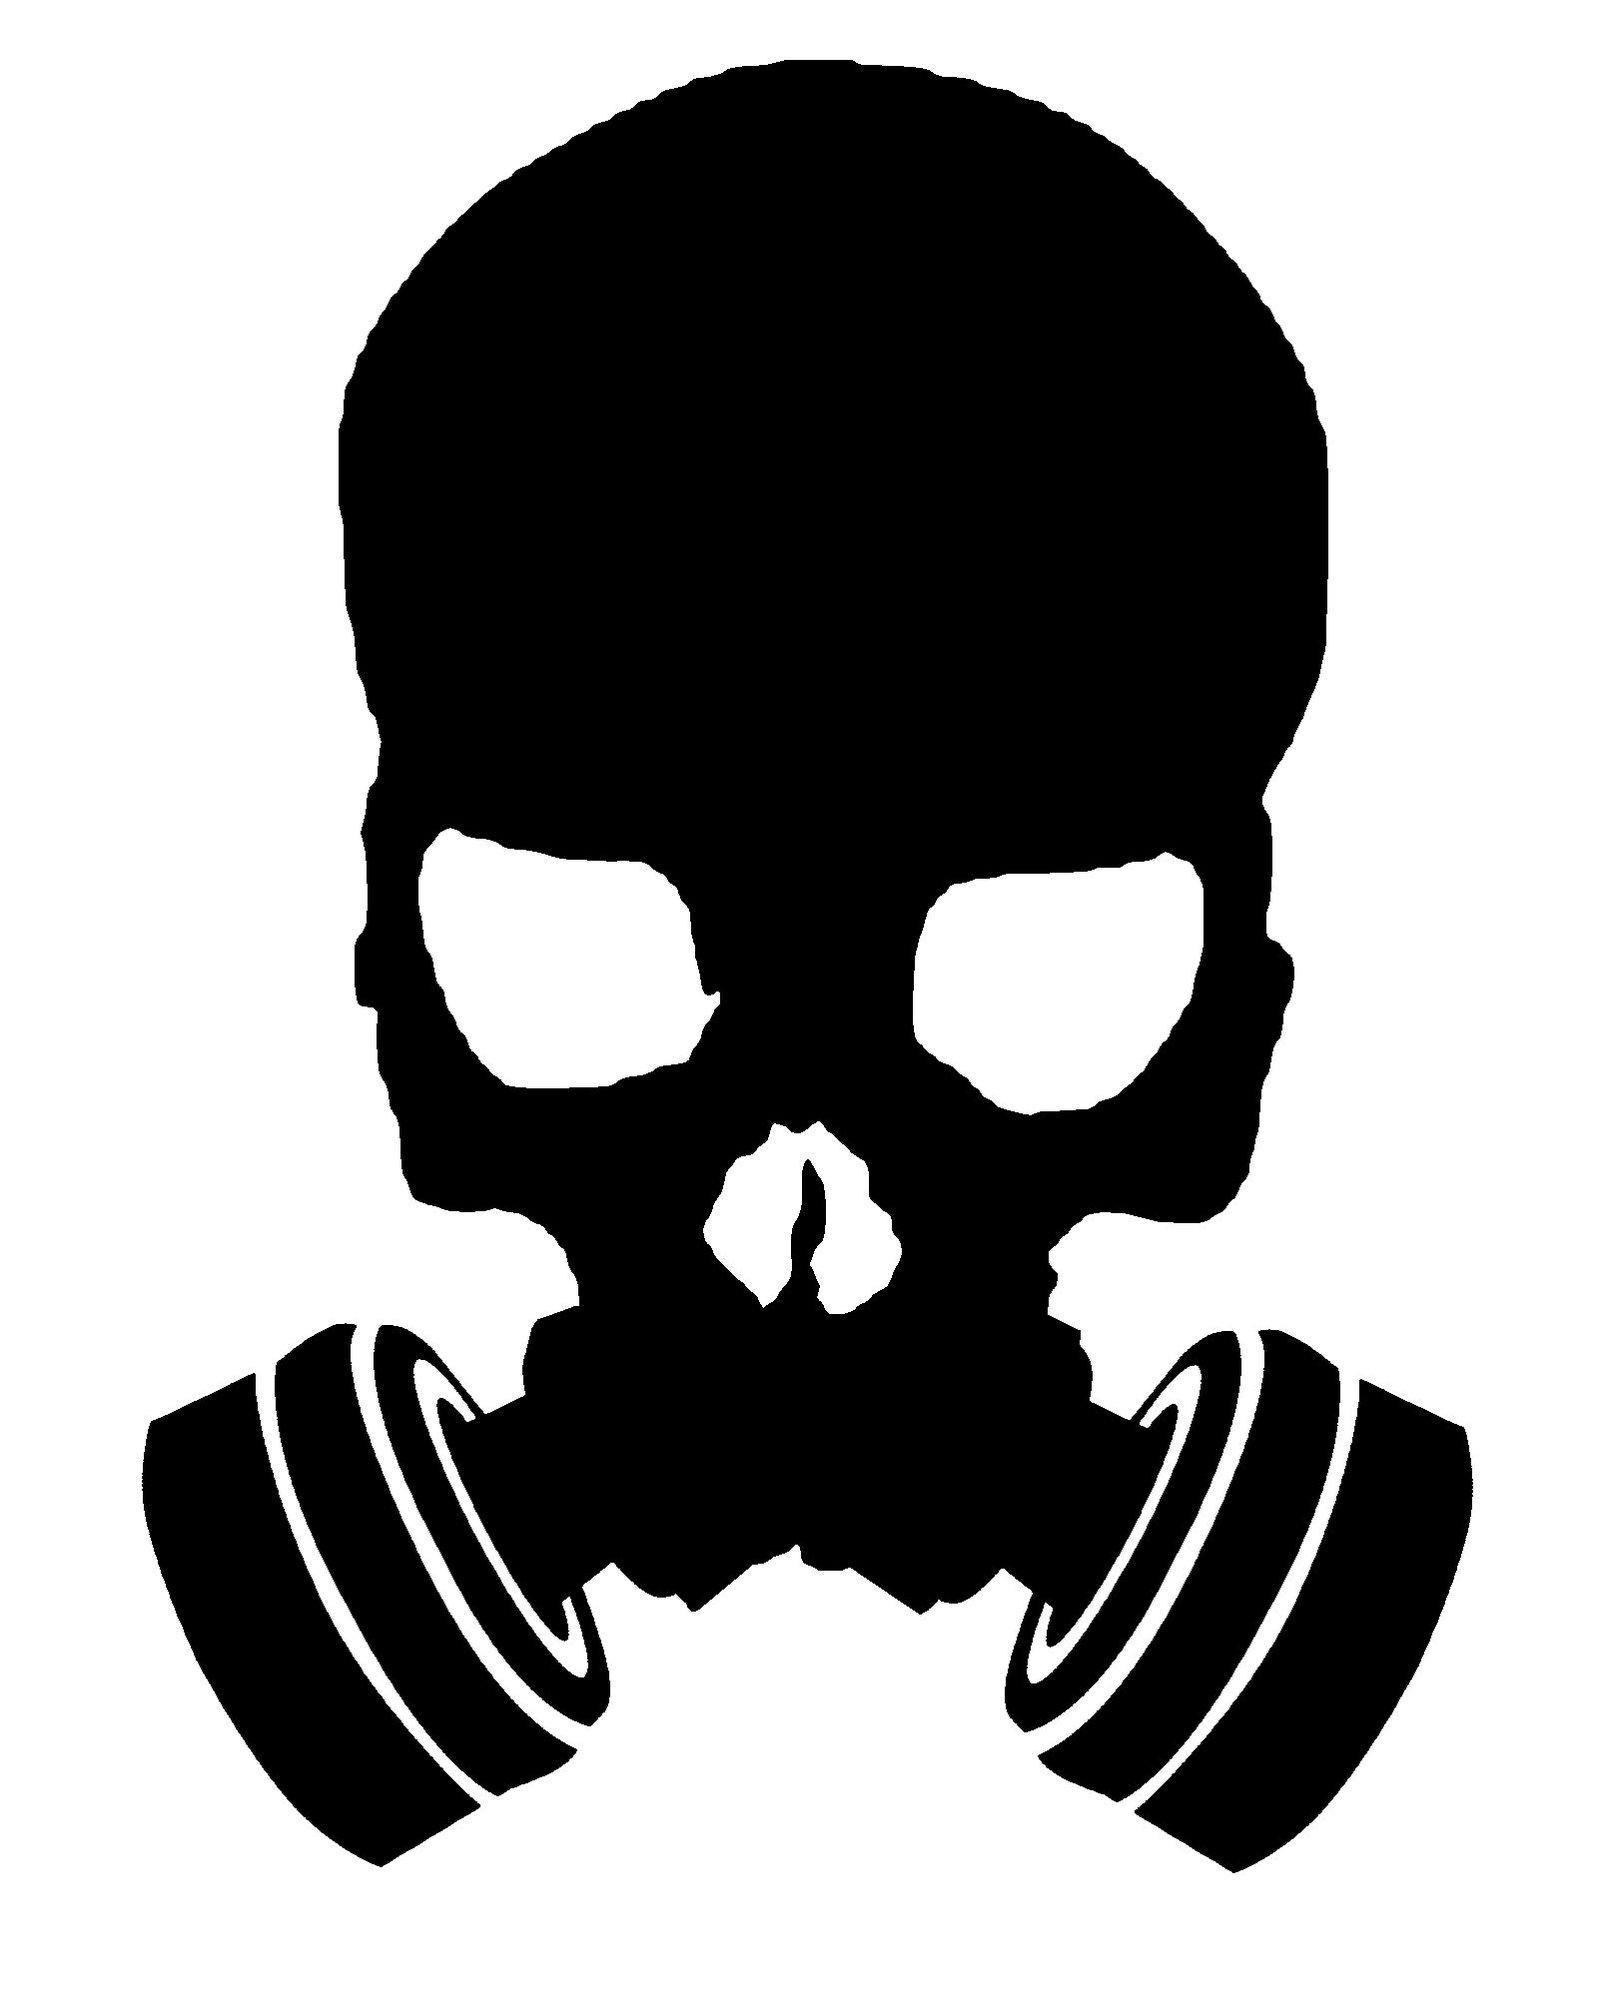 The mask cartoon clipart.